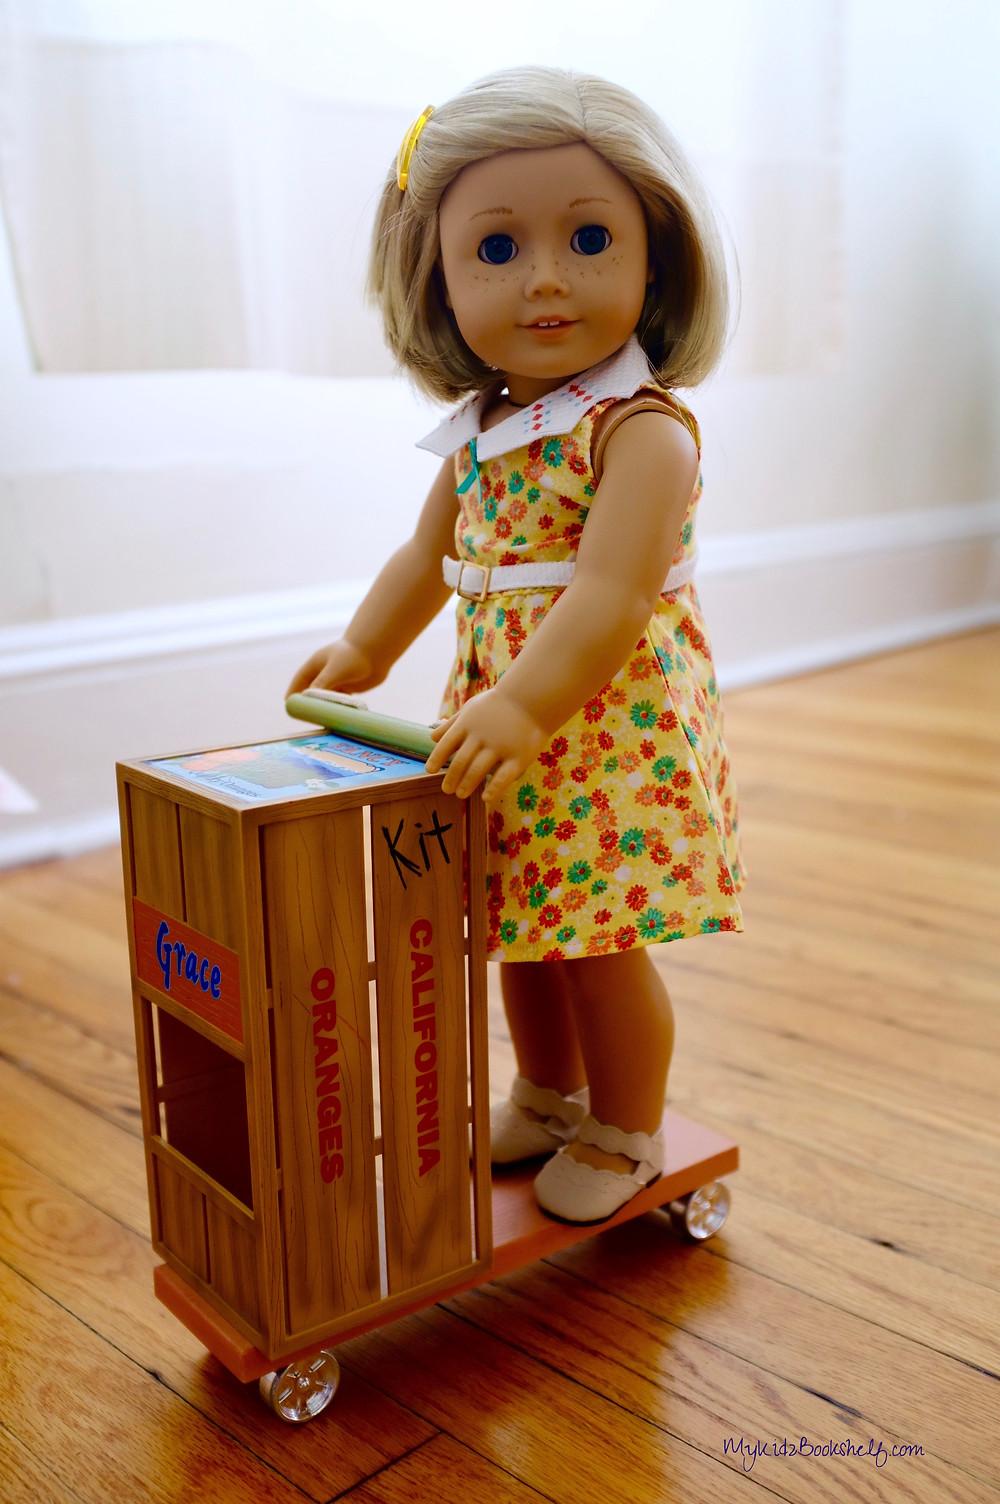 American-girl-Kit-Hello-Nantucket